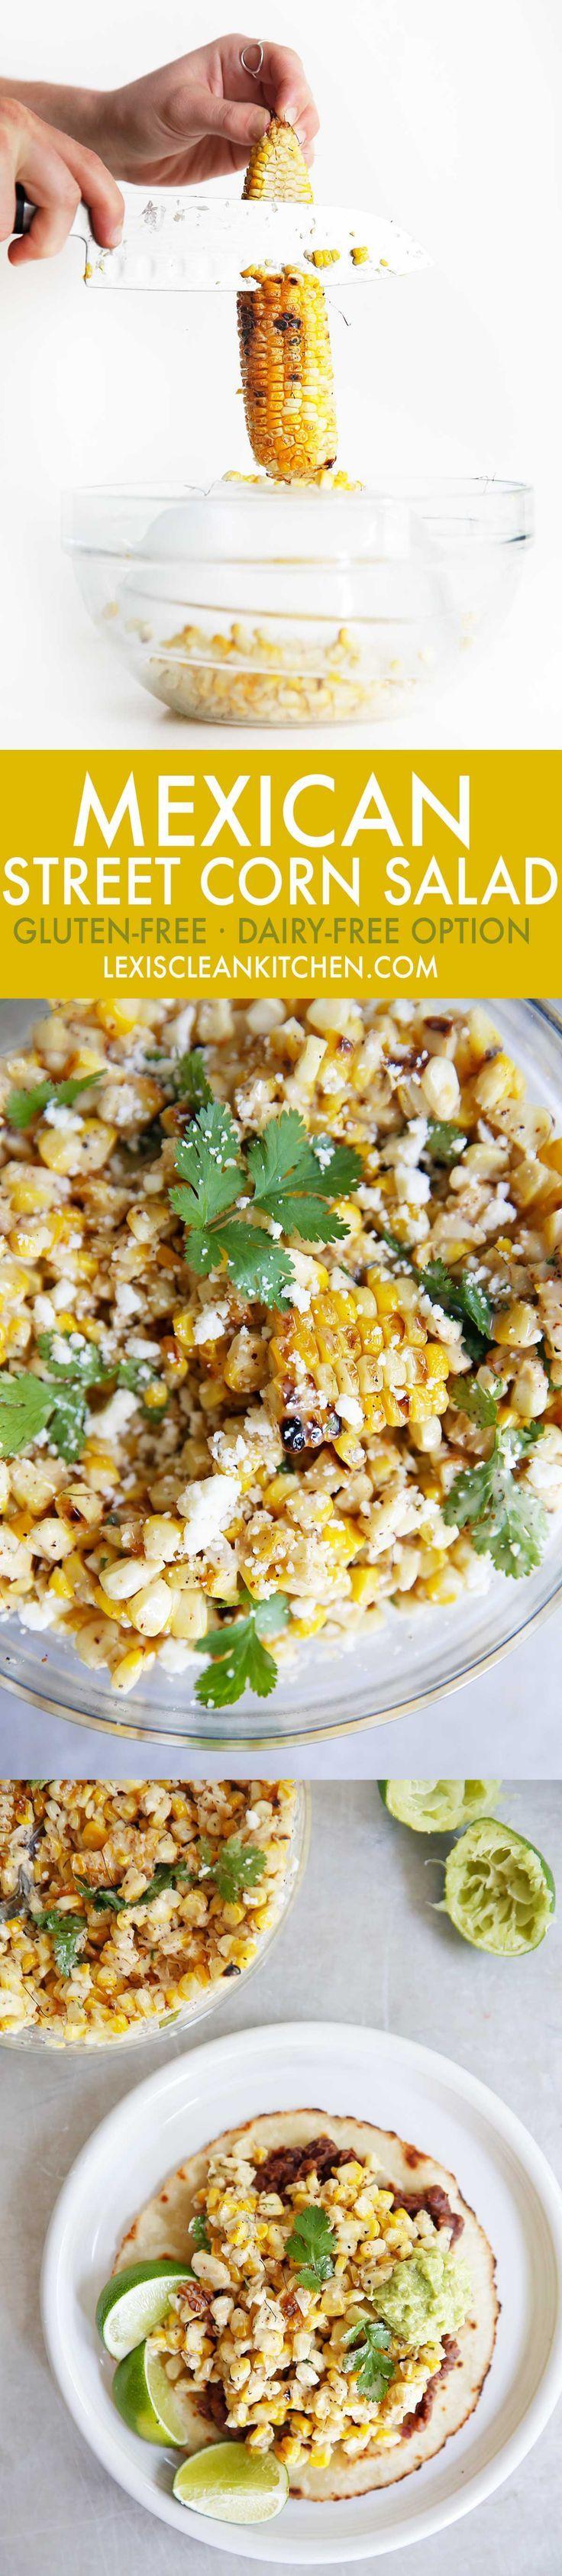 Mexikanischer Straßenmaissalat [VIDEO] - Lexis saubere Küche #mexicanstreetcorn